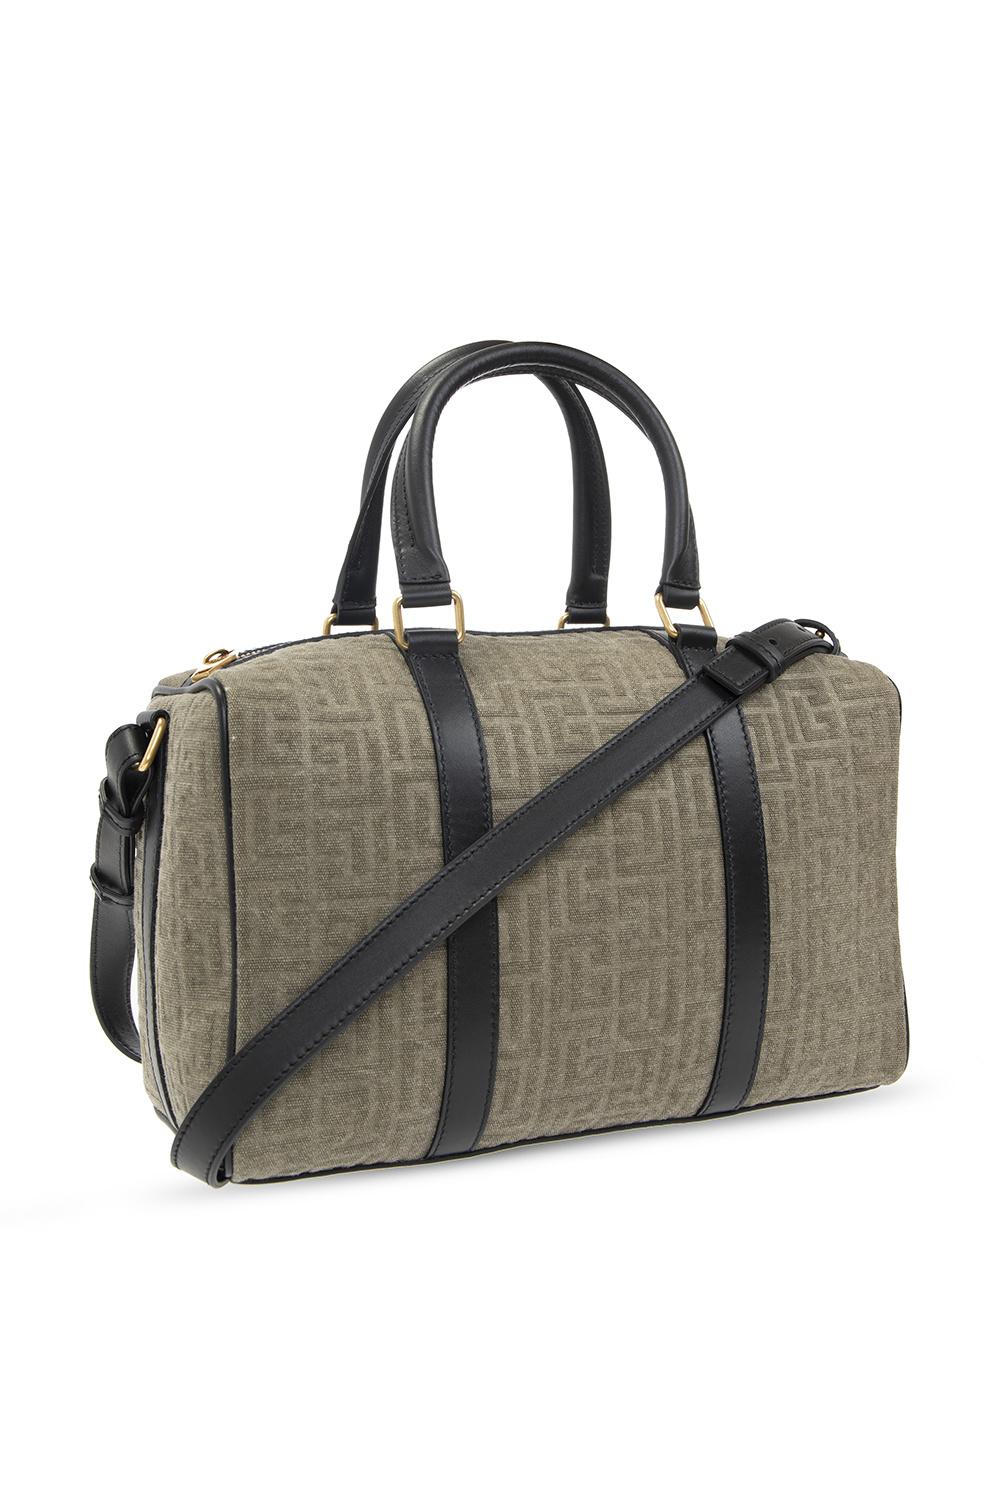 Balmain 'B-Army Medium' shoulder bag